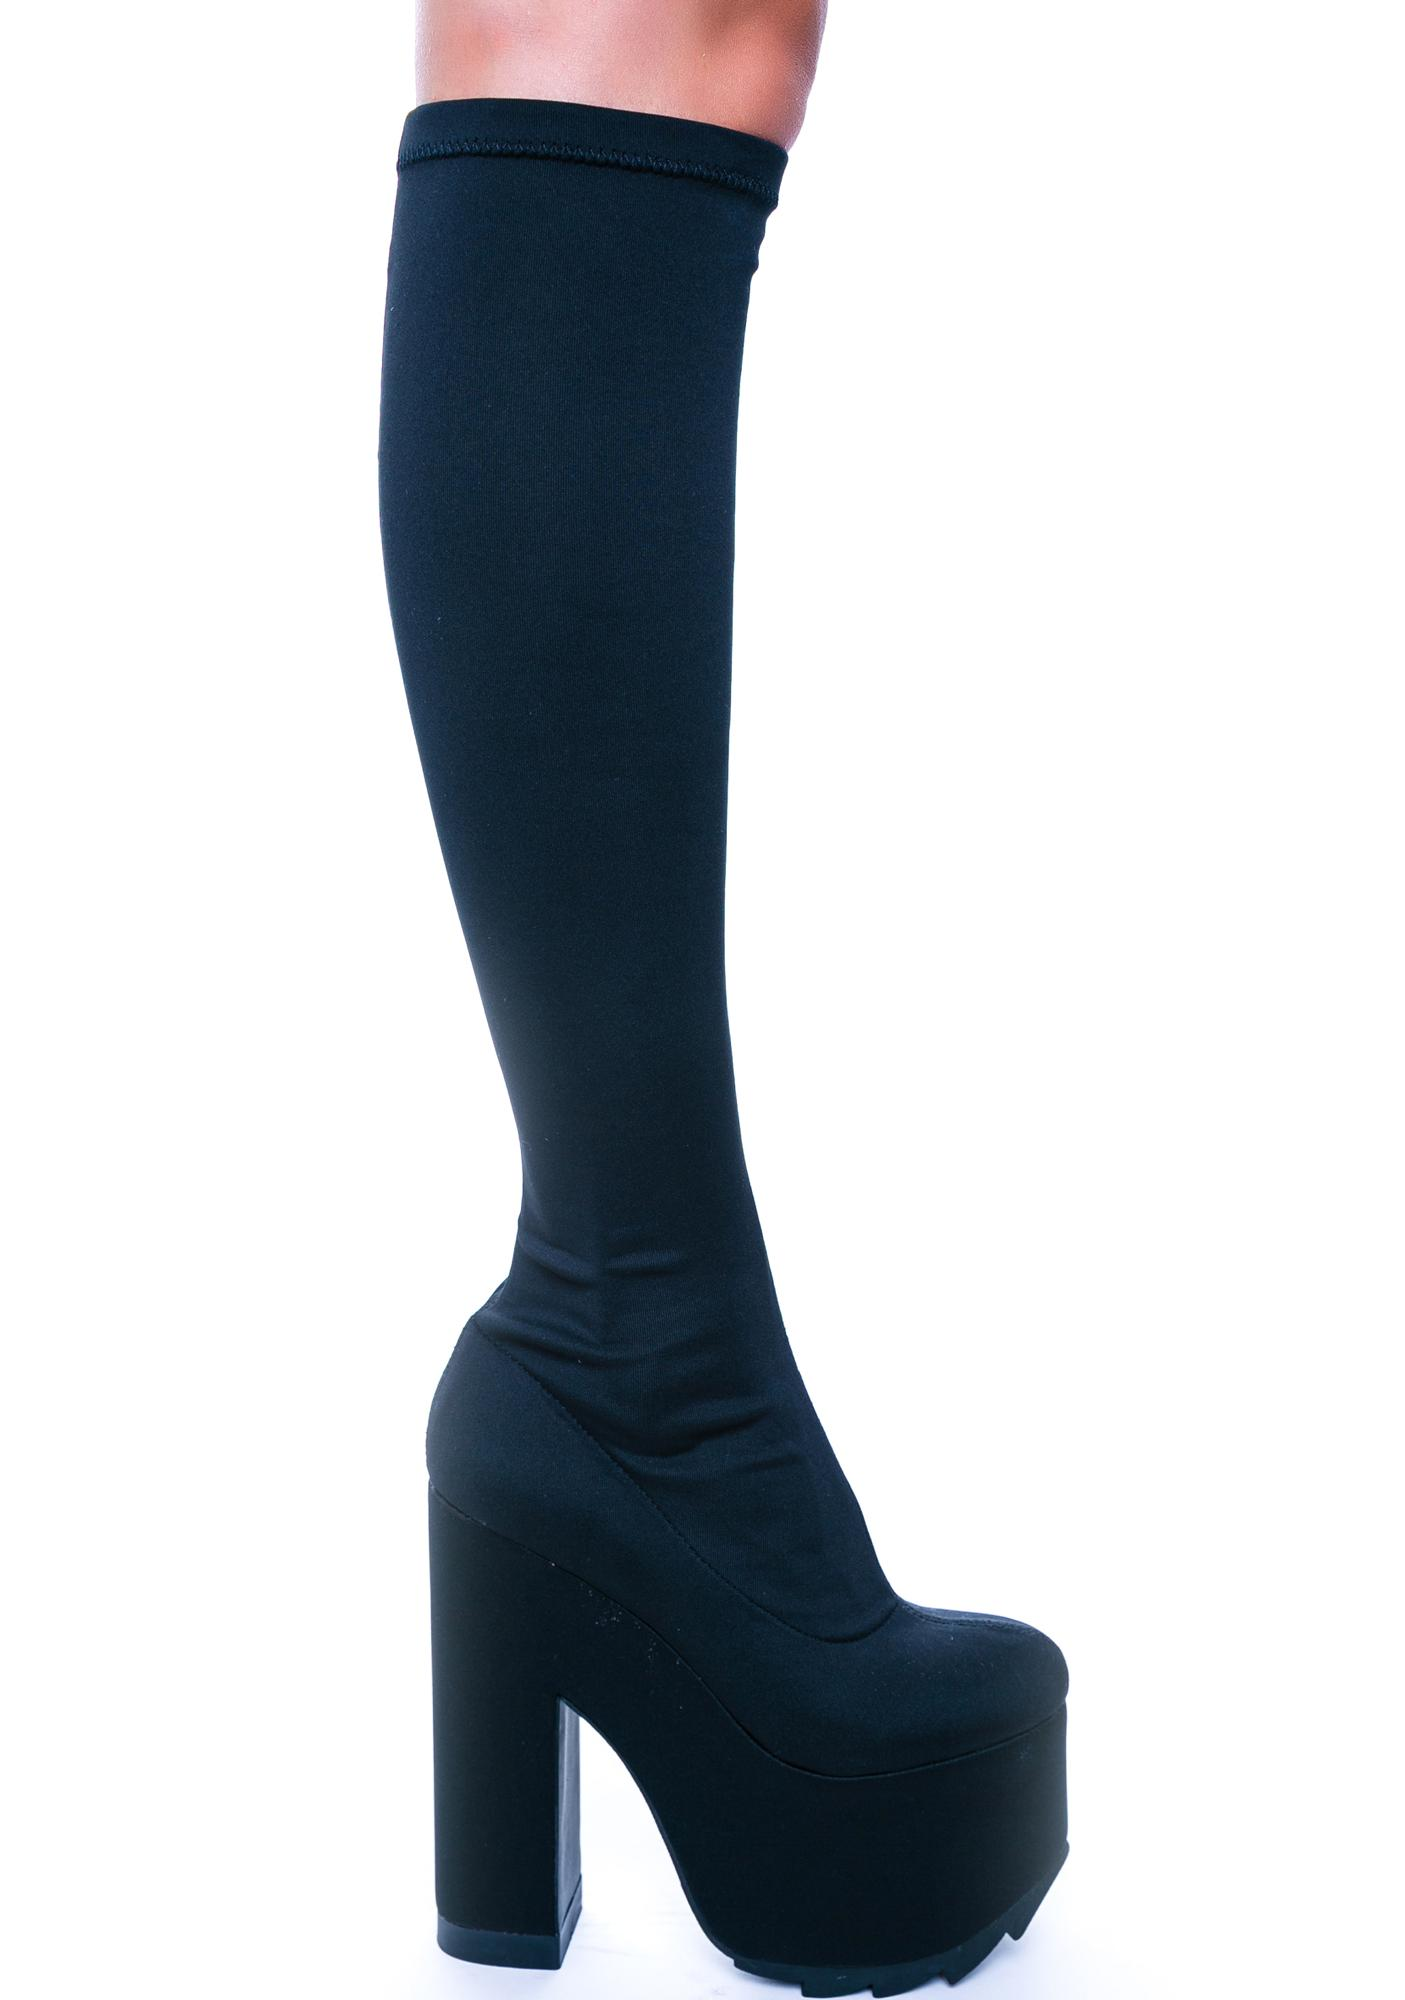 Y.R.U. Labyrinth Zipper Toe Boot